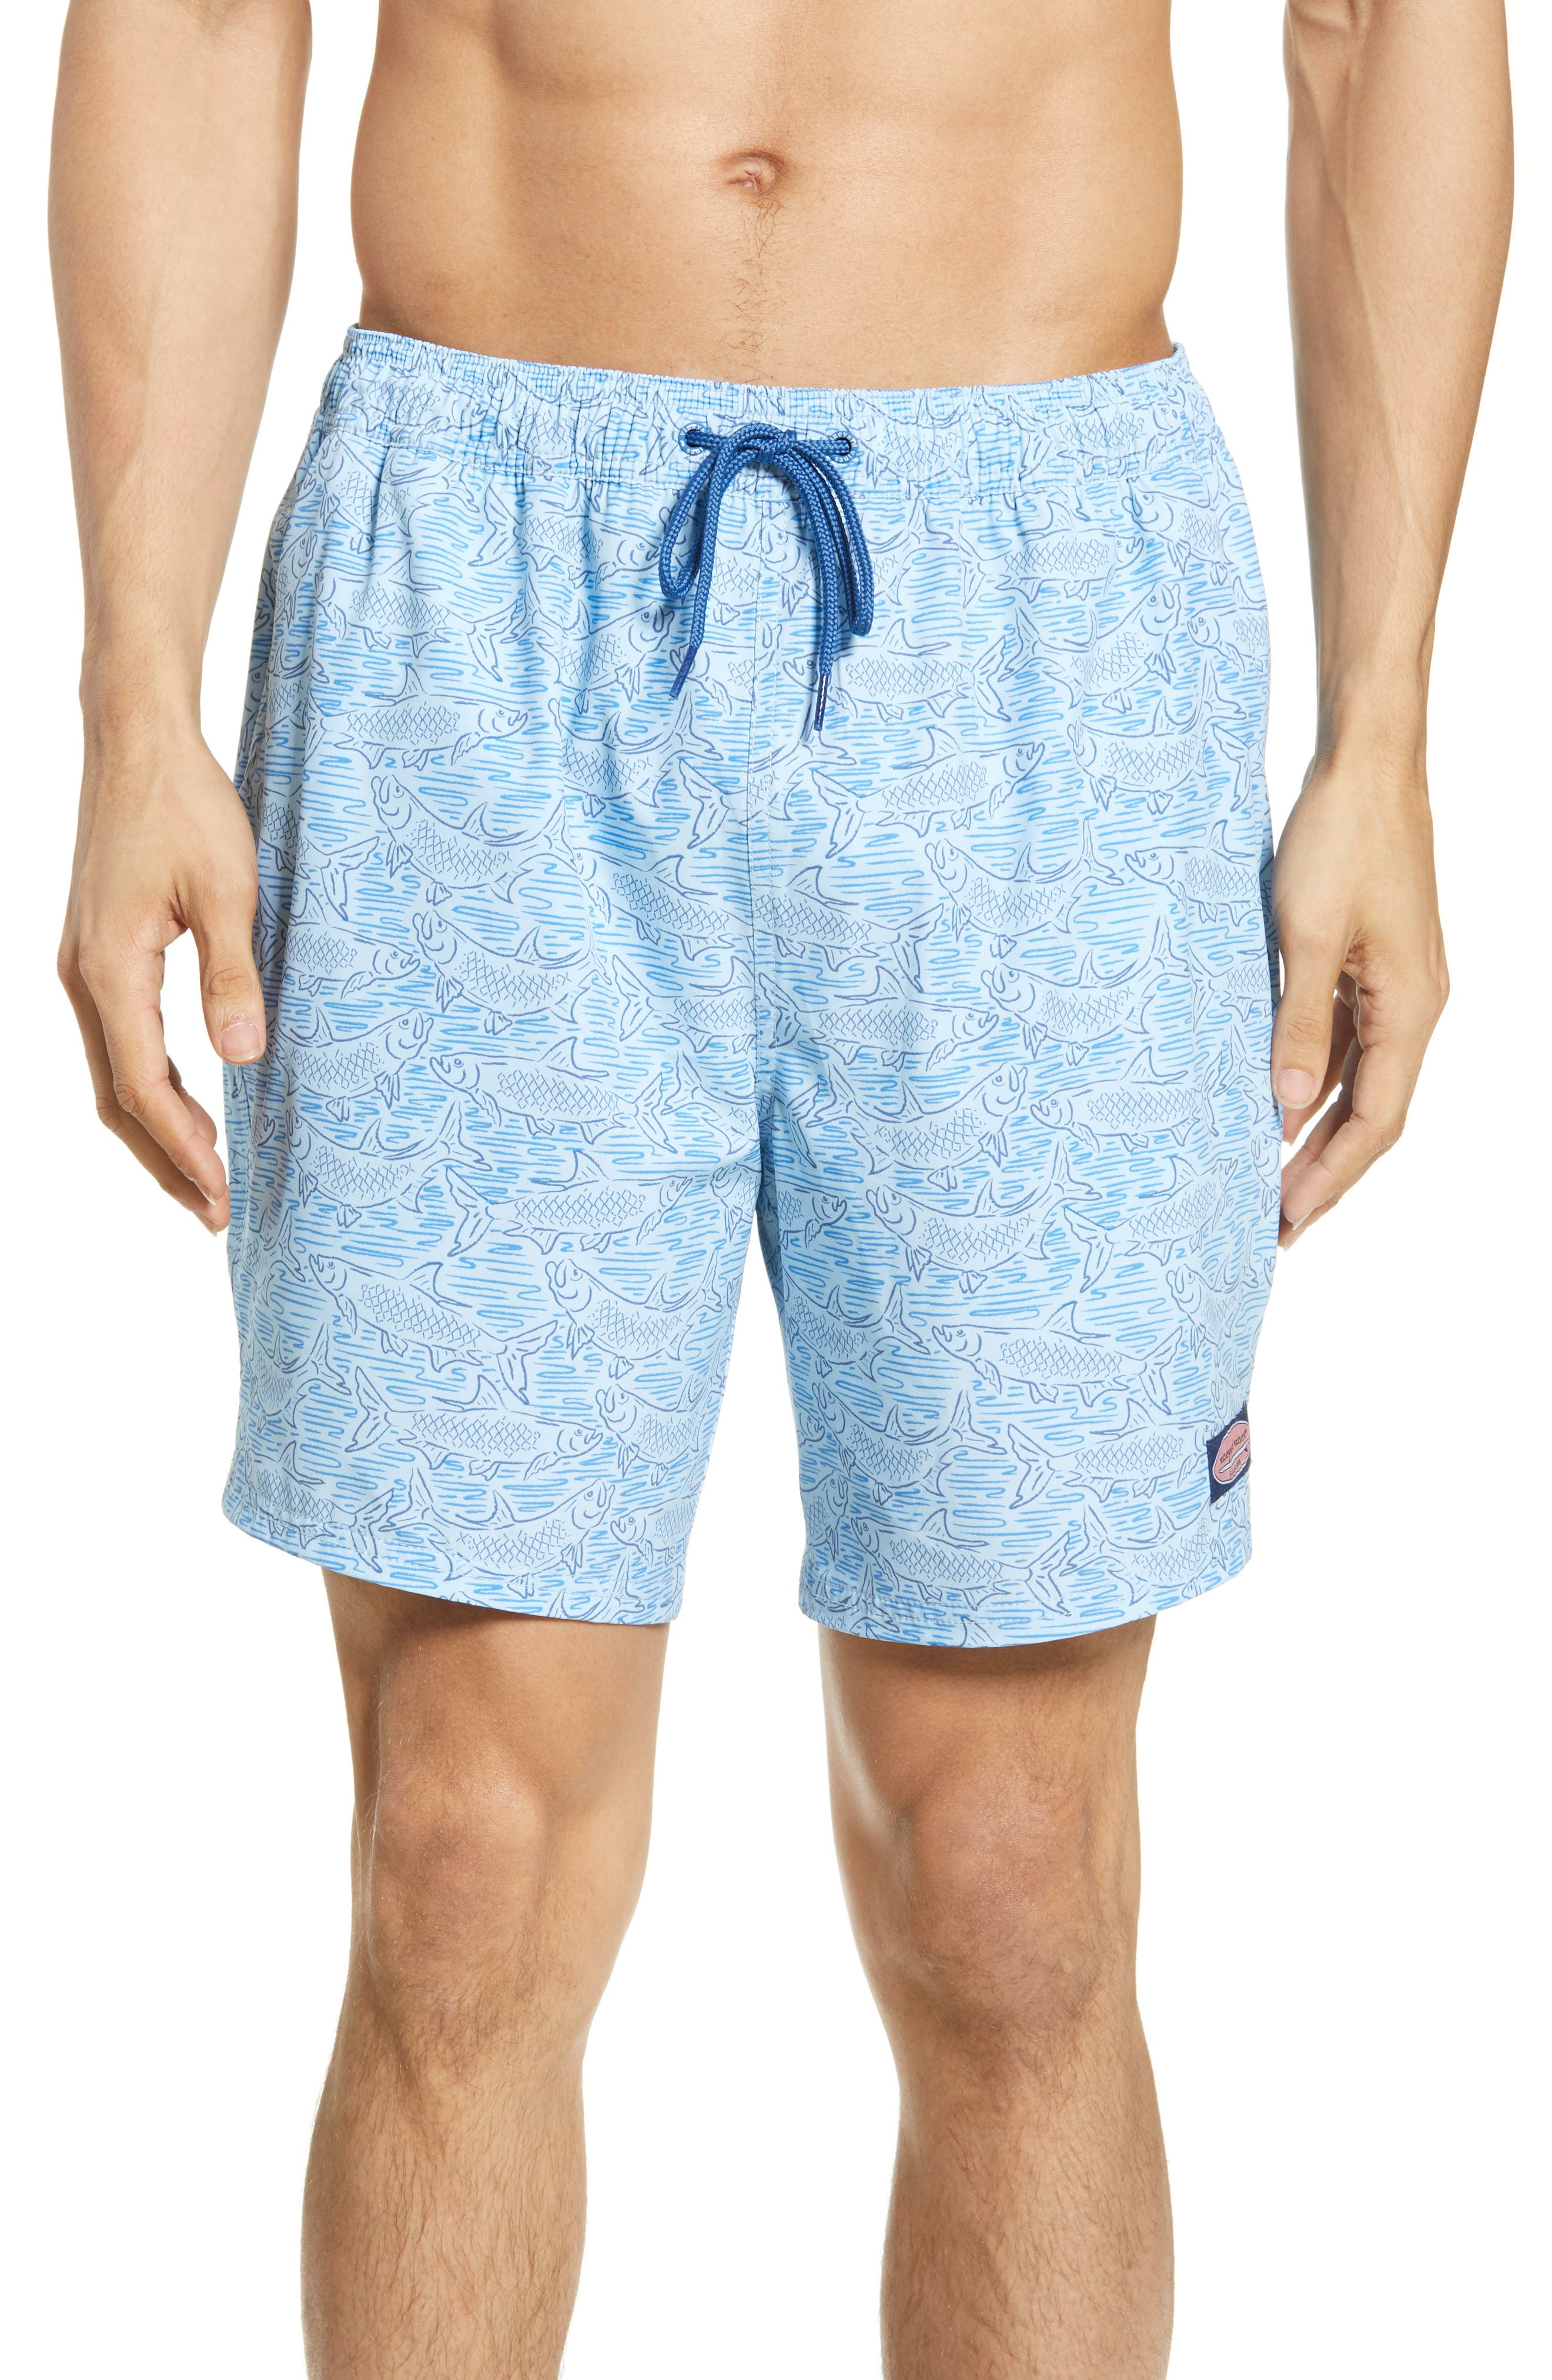 VINEYARD VINES Chappy Tarpon Stretch Swim Trunks, Main, color, JAKE BLUE